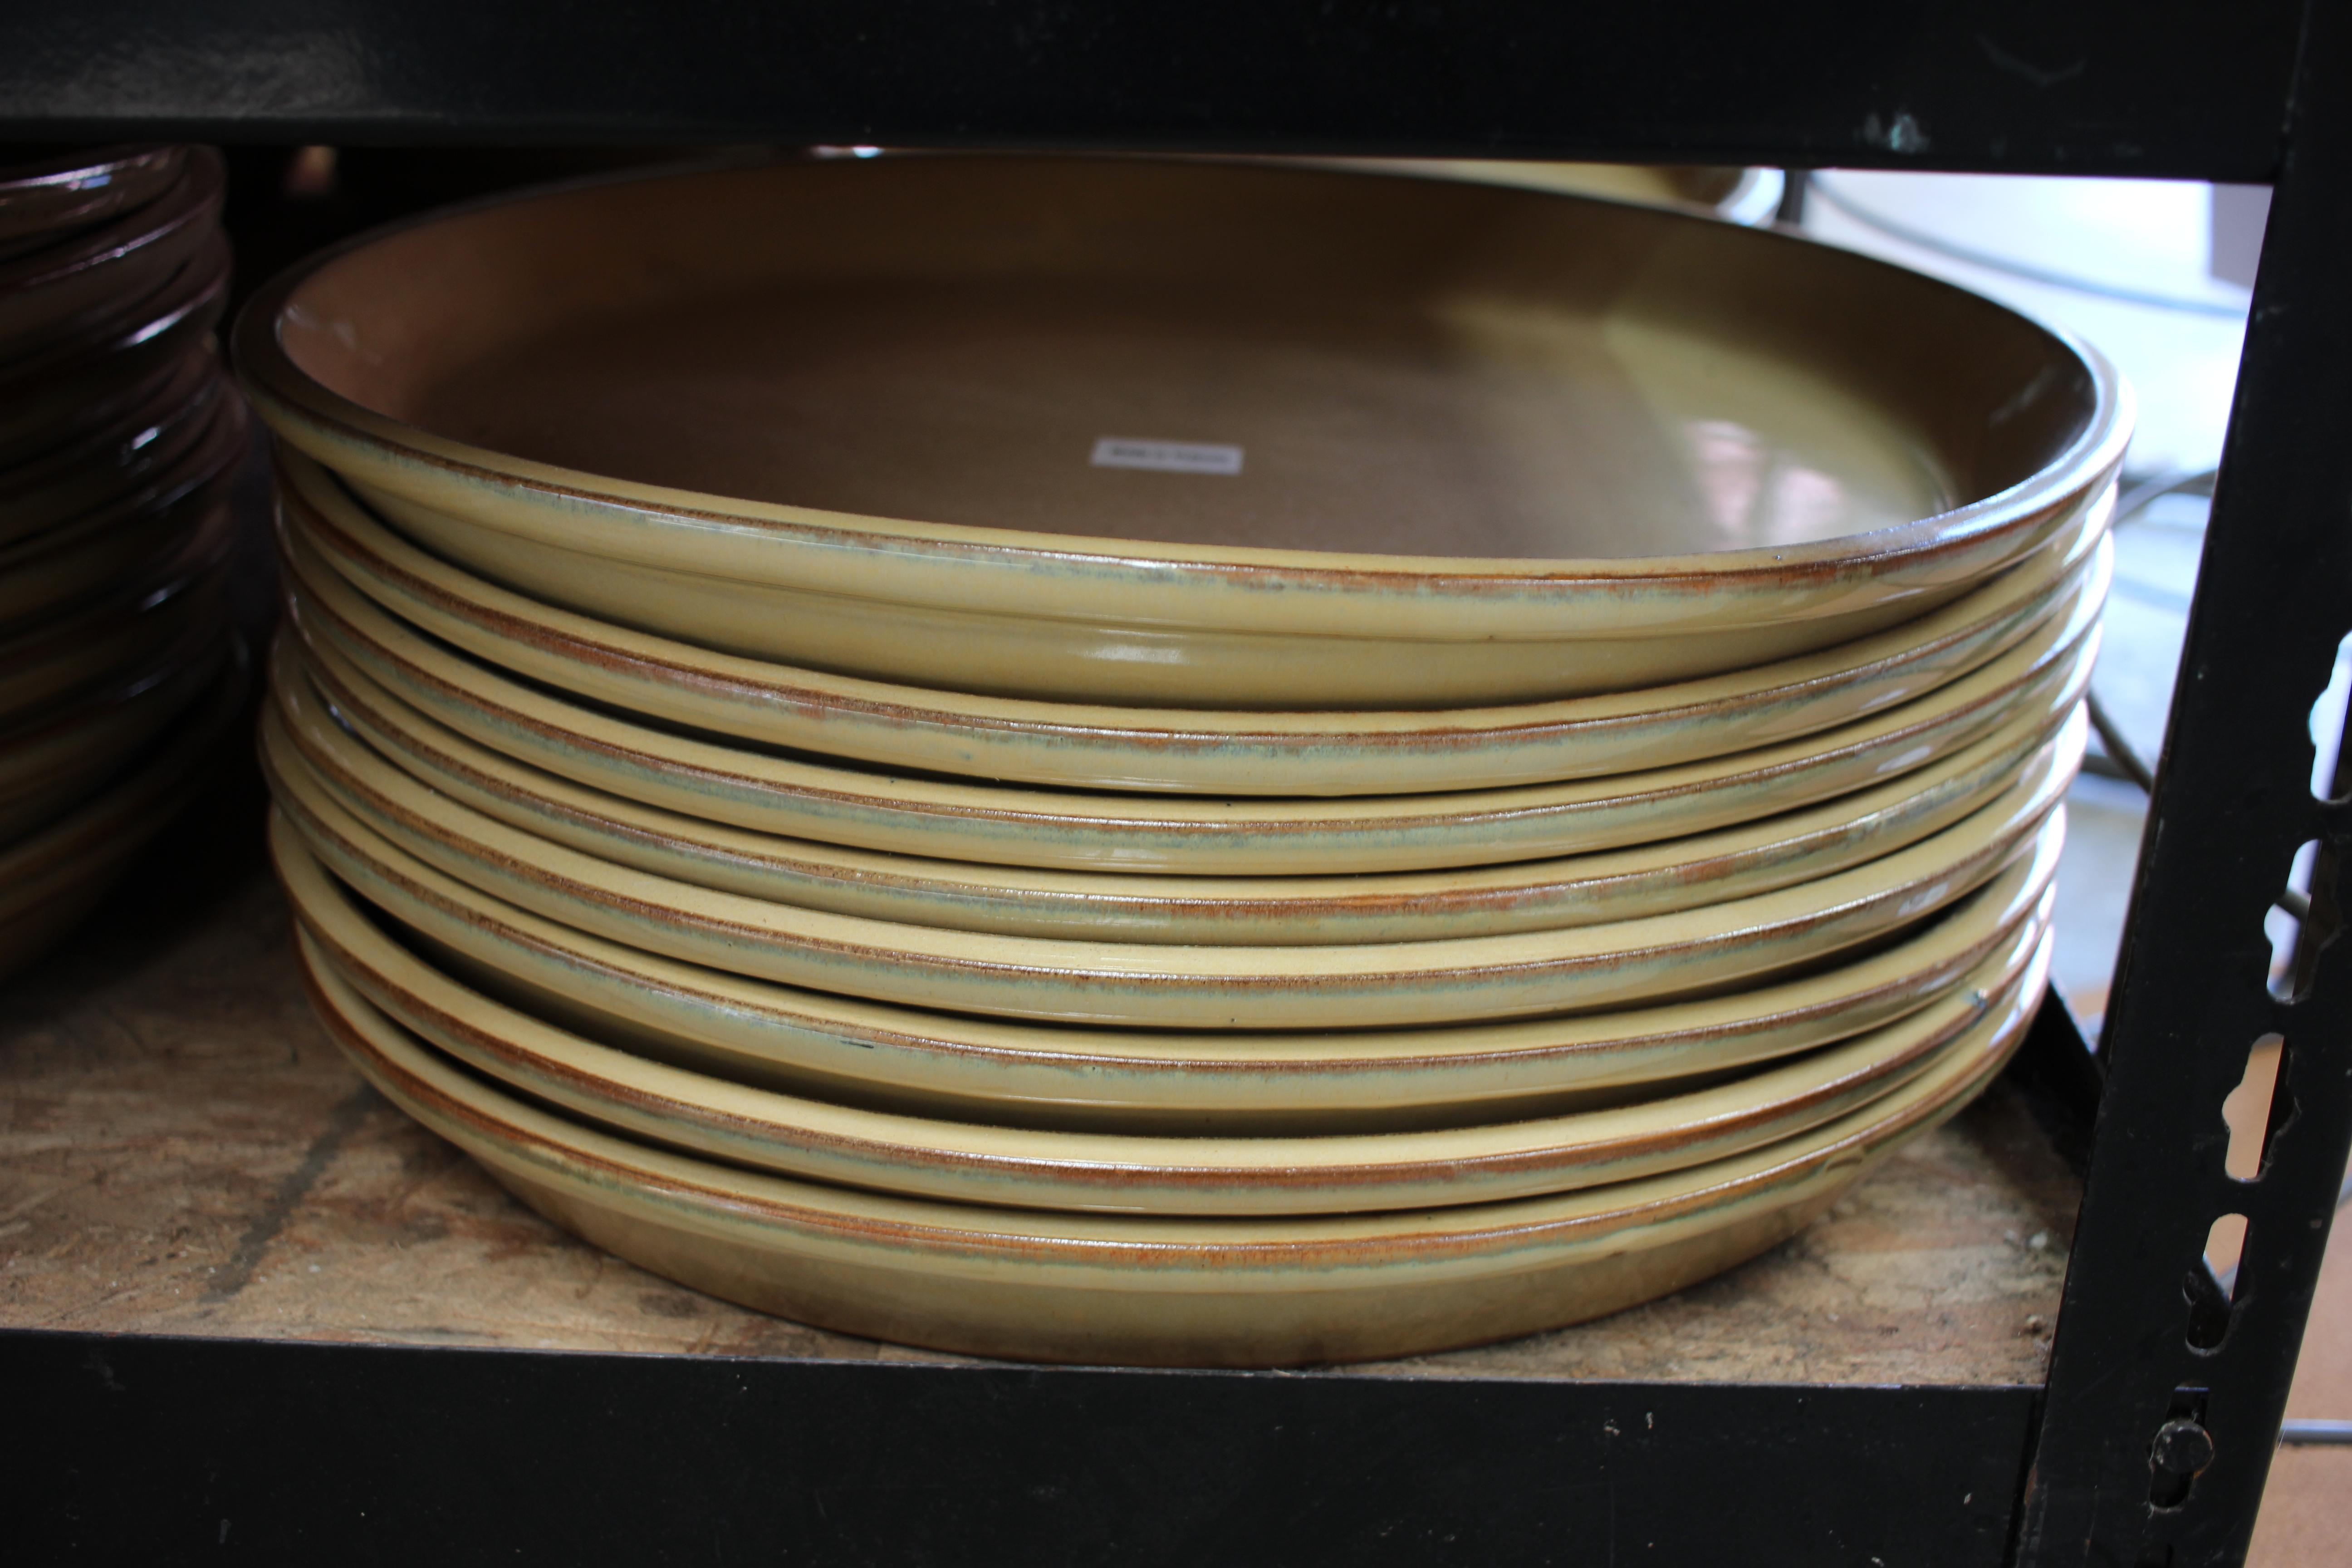 Vietnamese Round Saucers